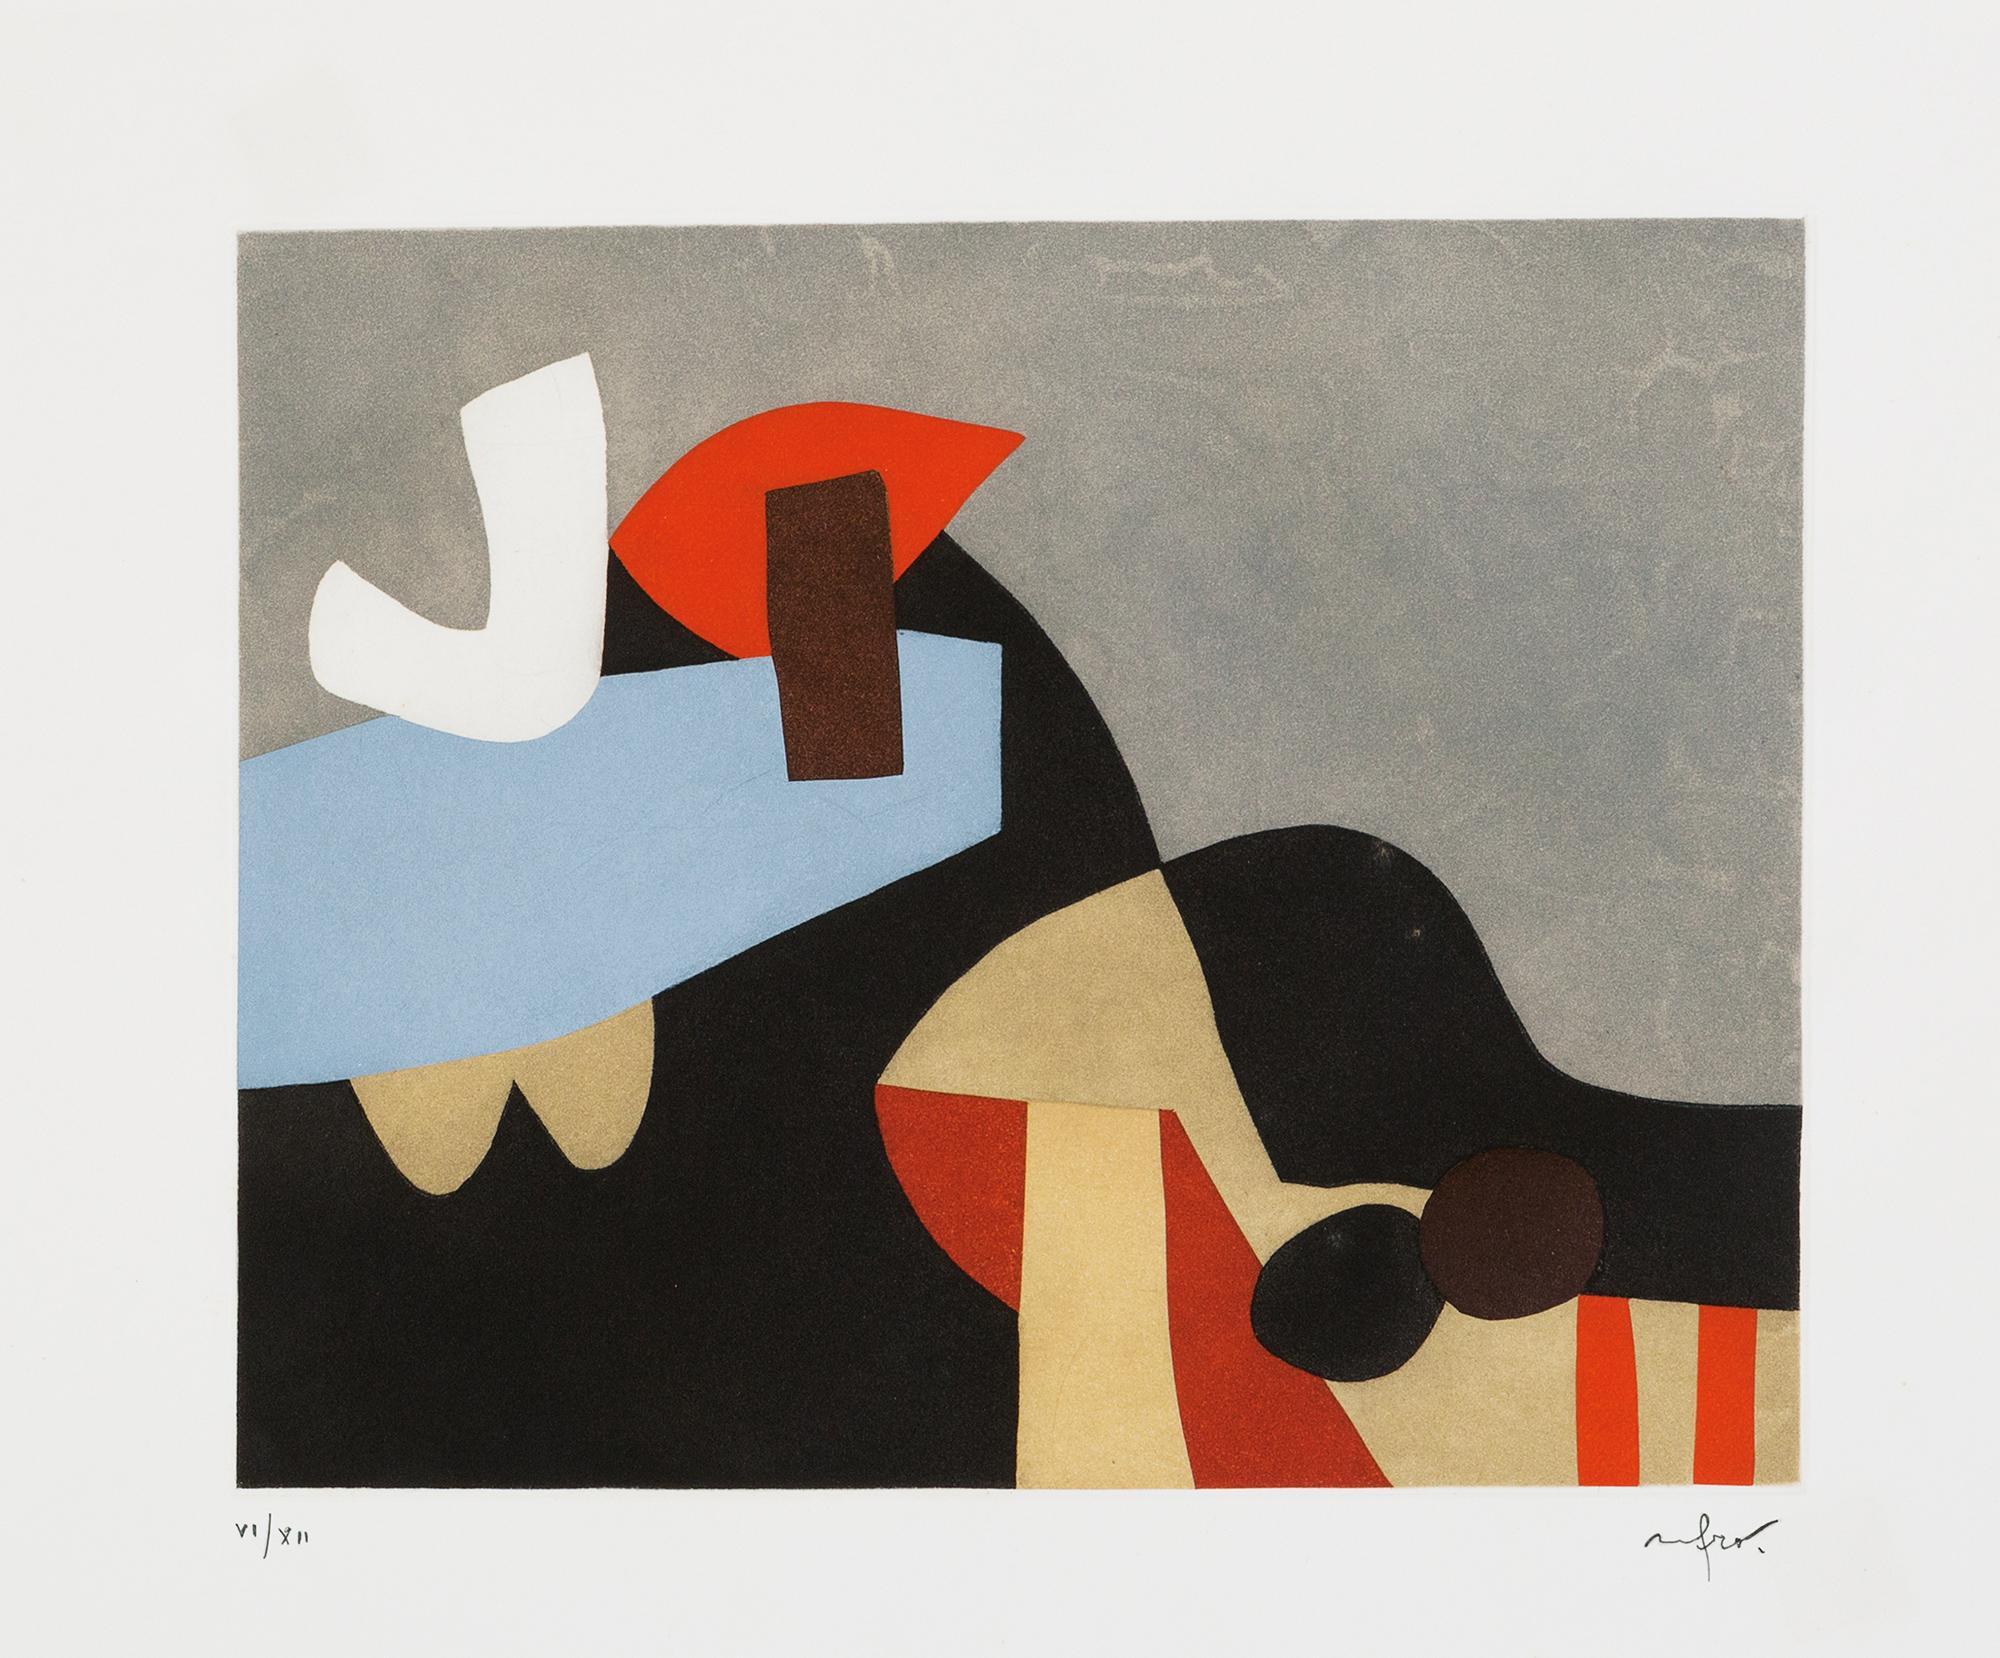 Baudelaire – L'invitation au voyage, Tav.A, 1975